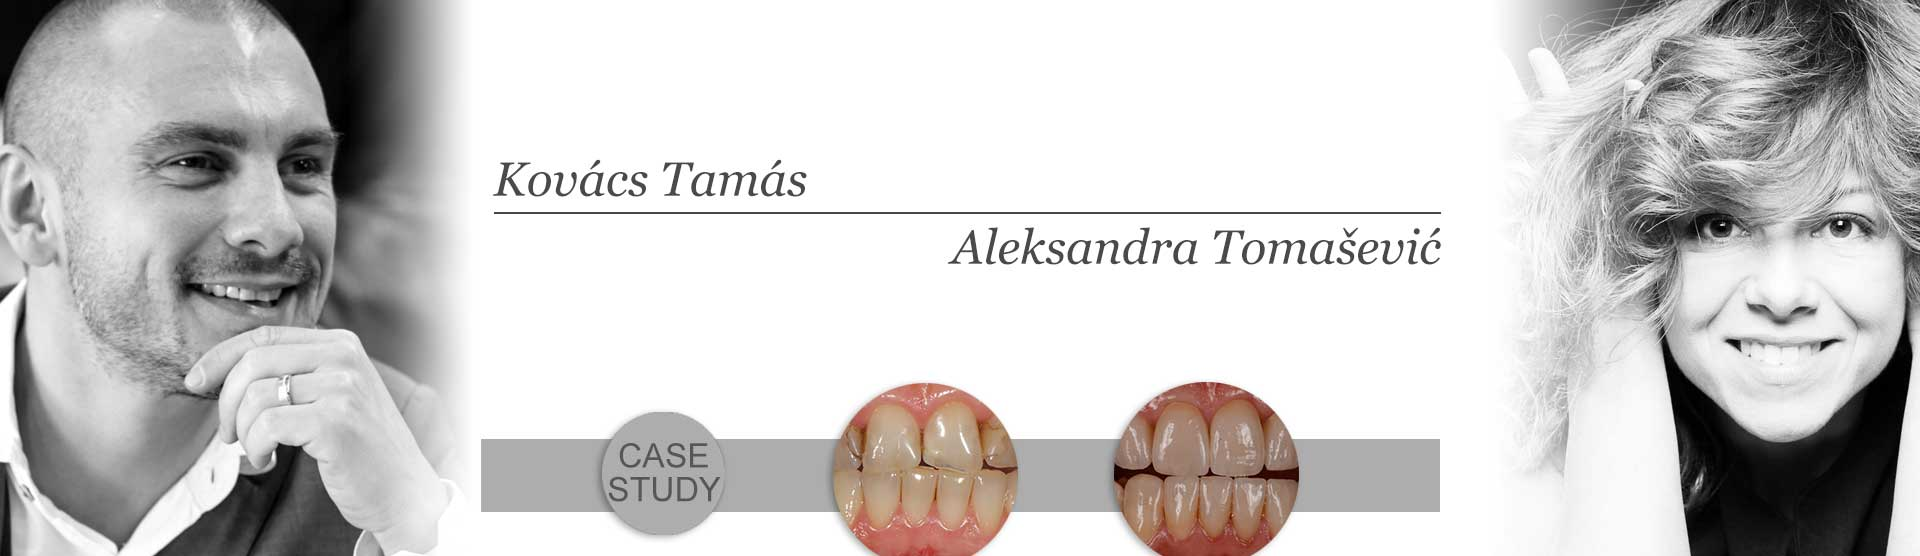 Studija slučaja Dr Tamás Kovács-a:Funkcionalno-estetska rehabilitacija